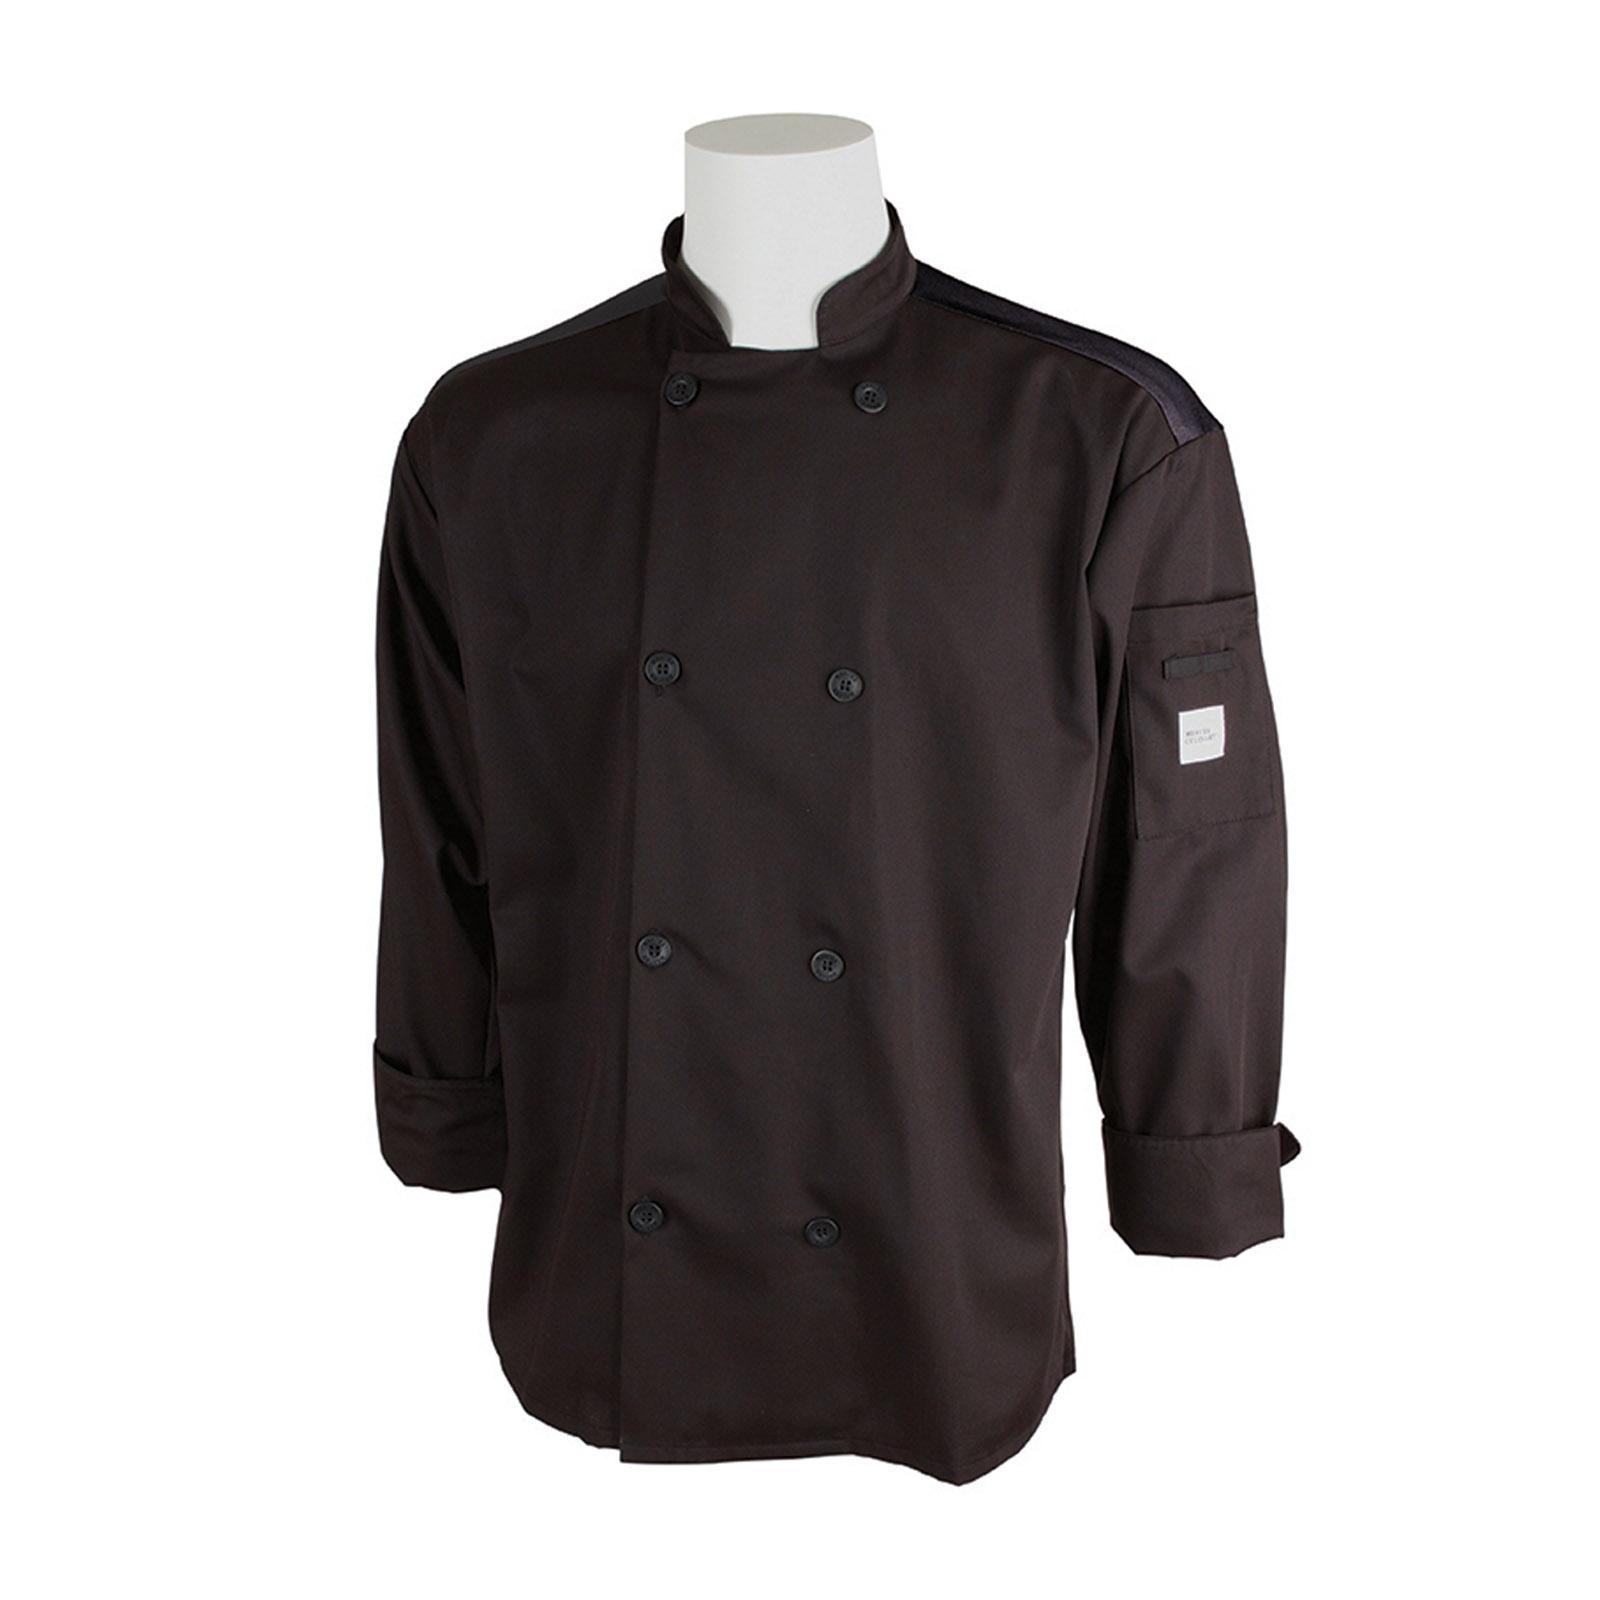 Mercer Culinary M60017BK2X chef's coat